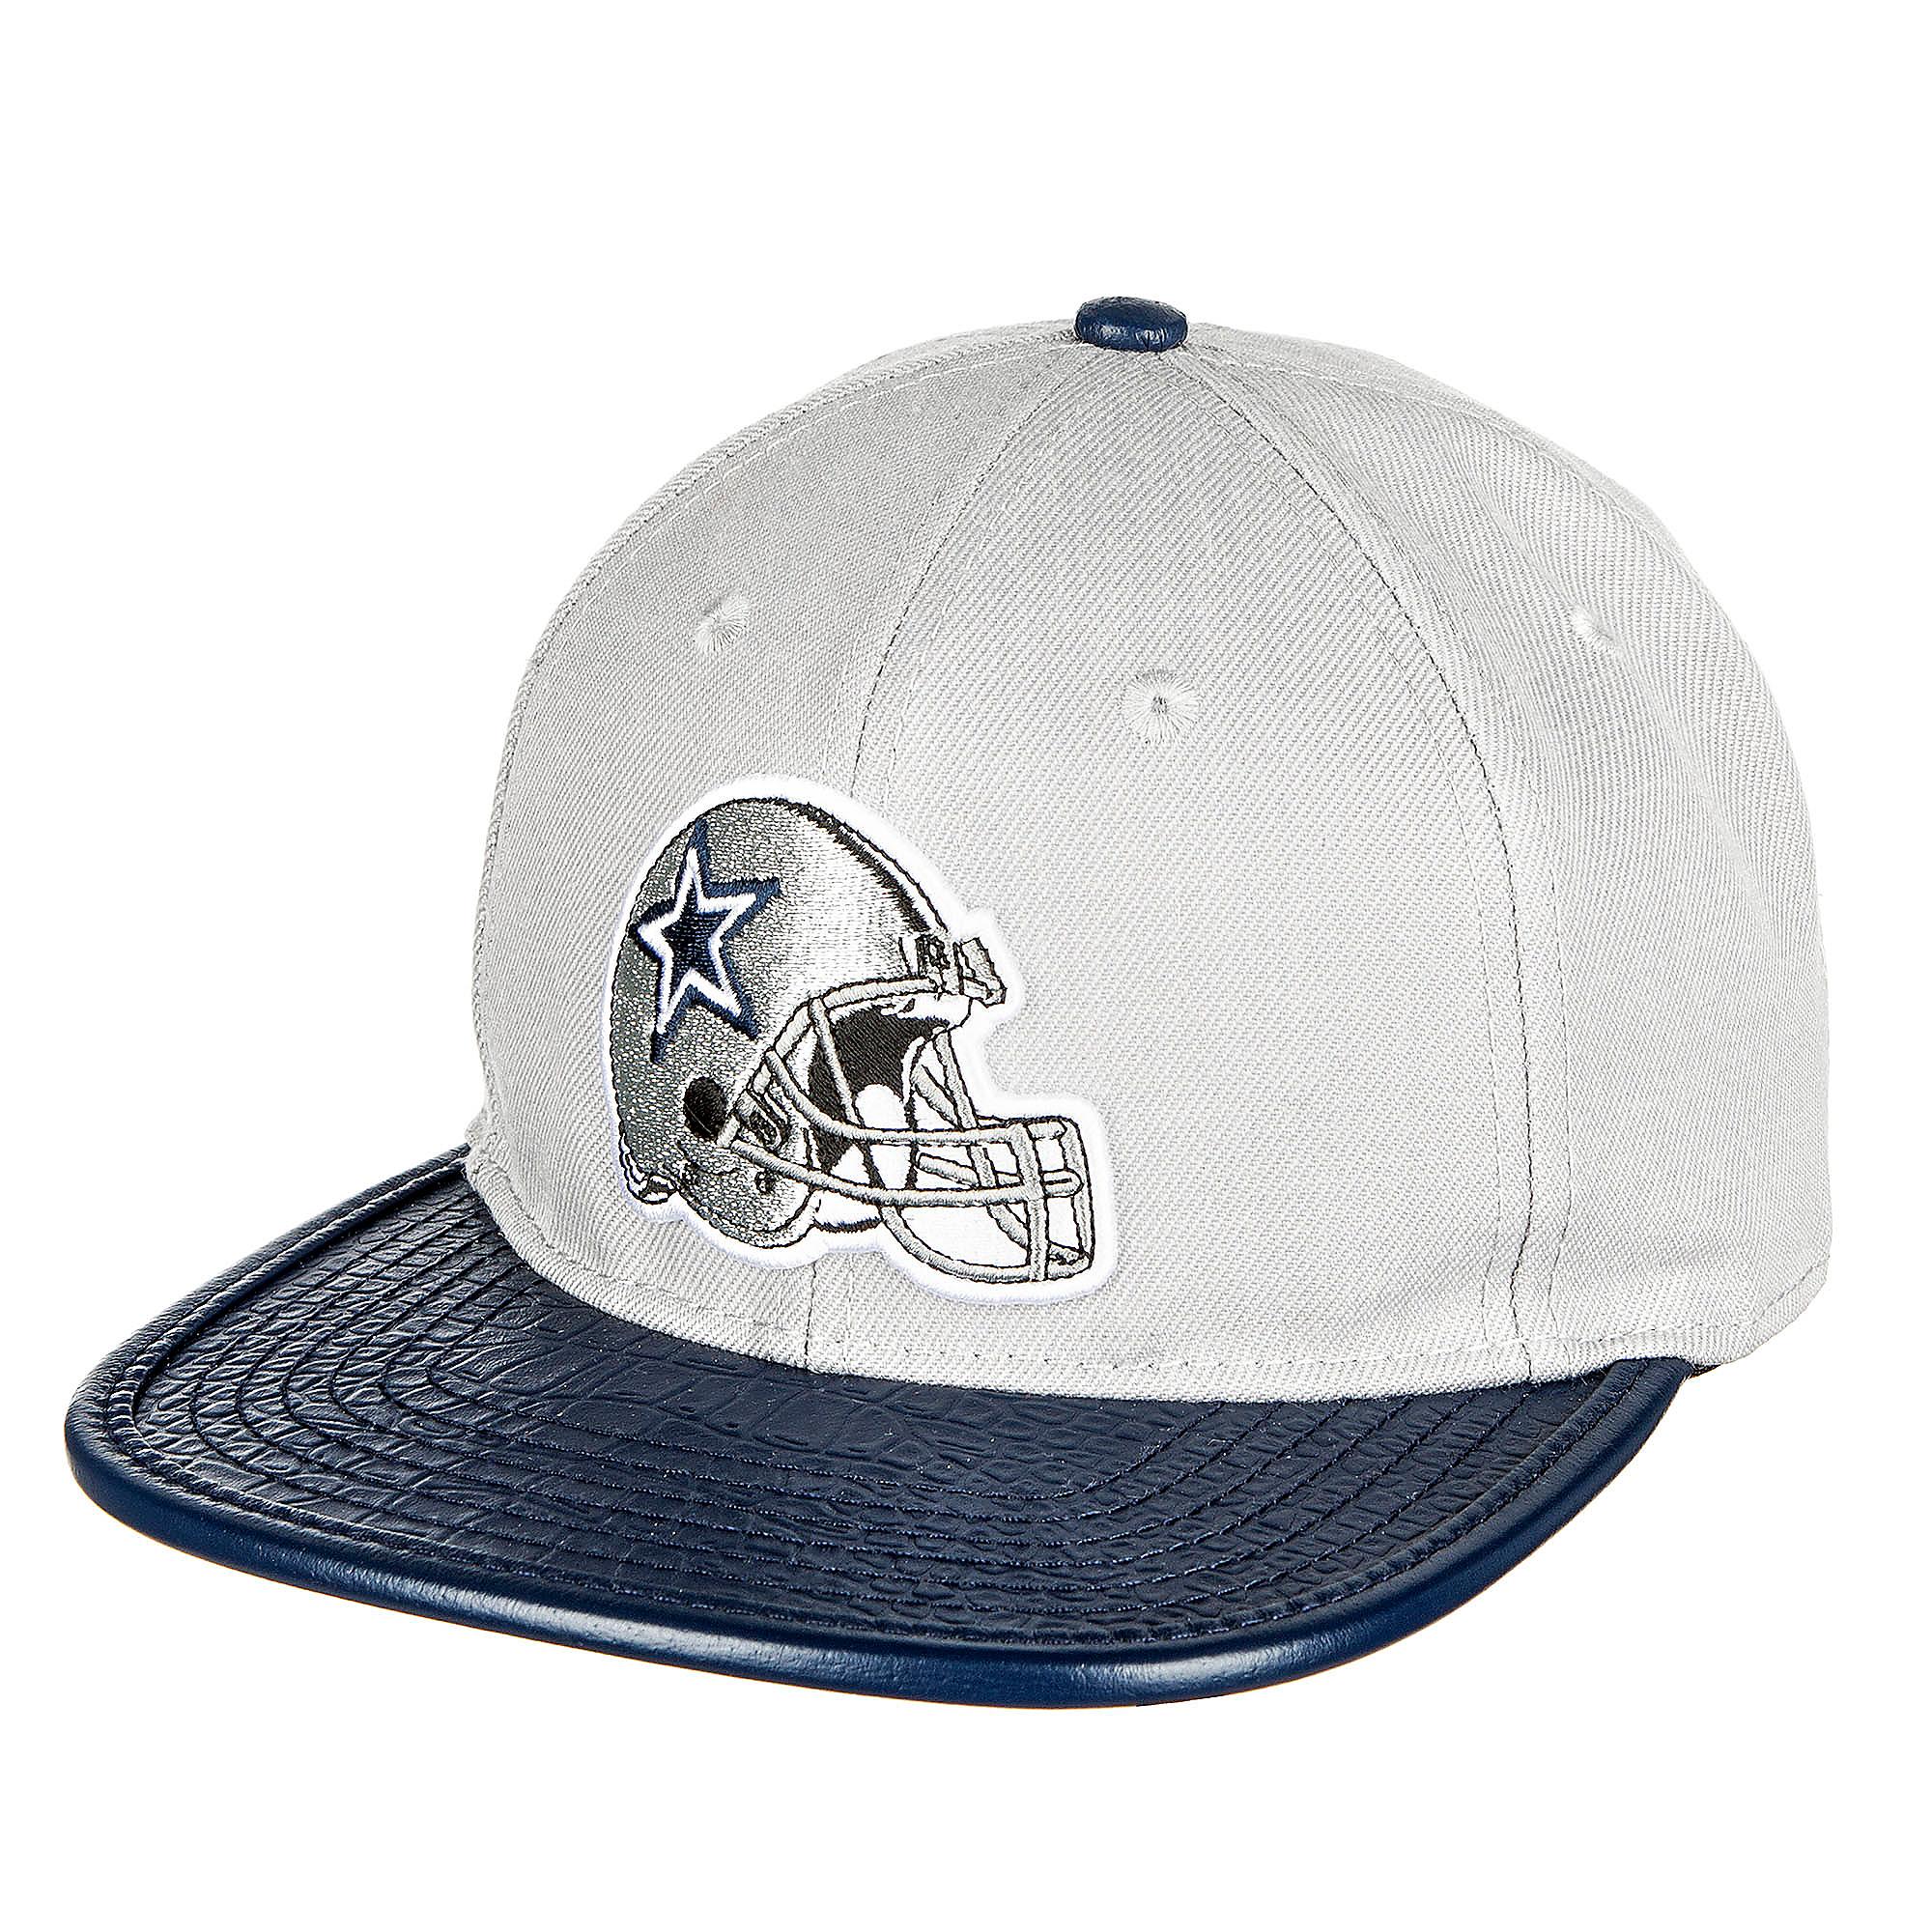 Dallas Cowboys Pro Standard Helmet Logo Cap